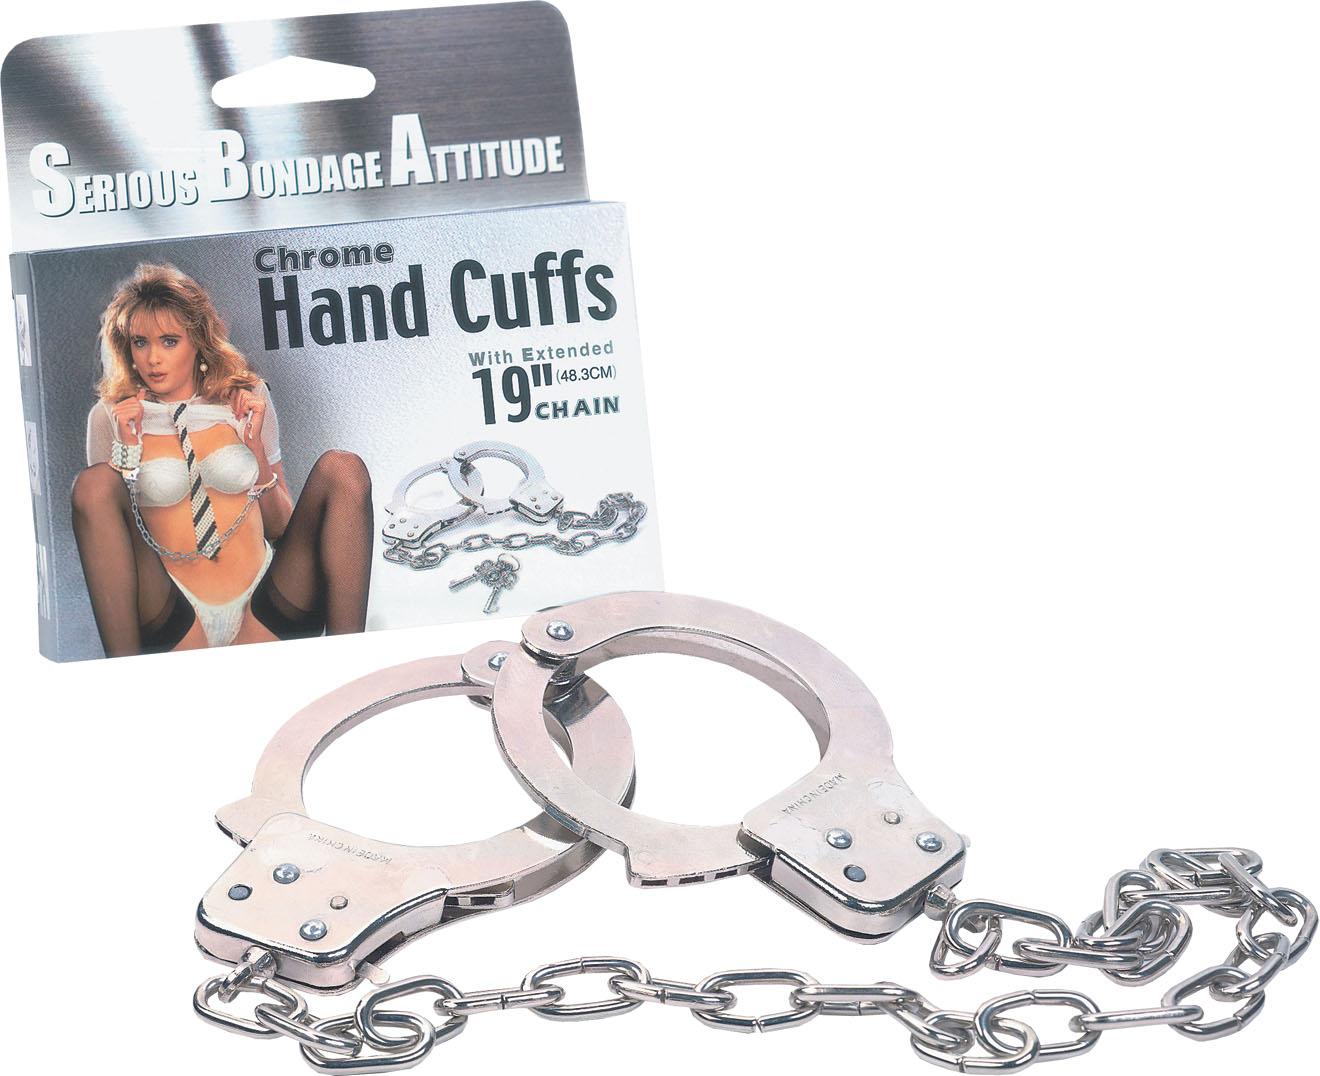 Chrome Handcuffs Metal handcuffs w. key